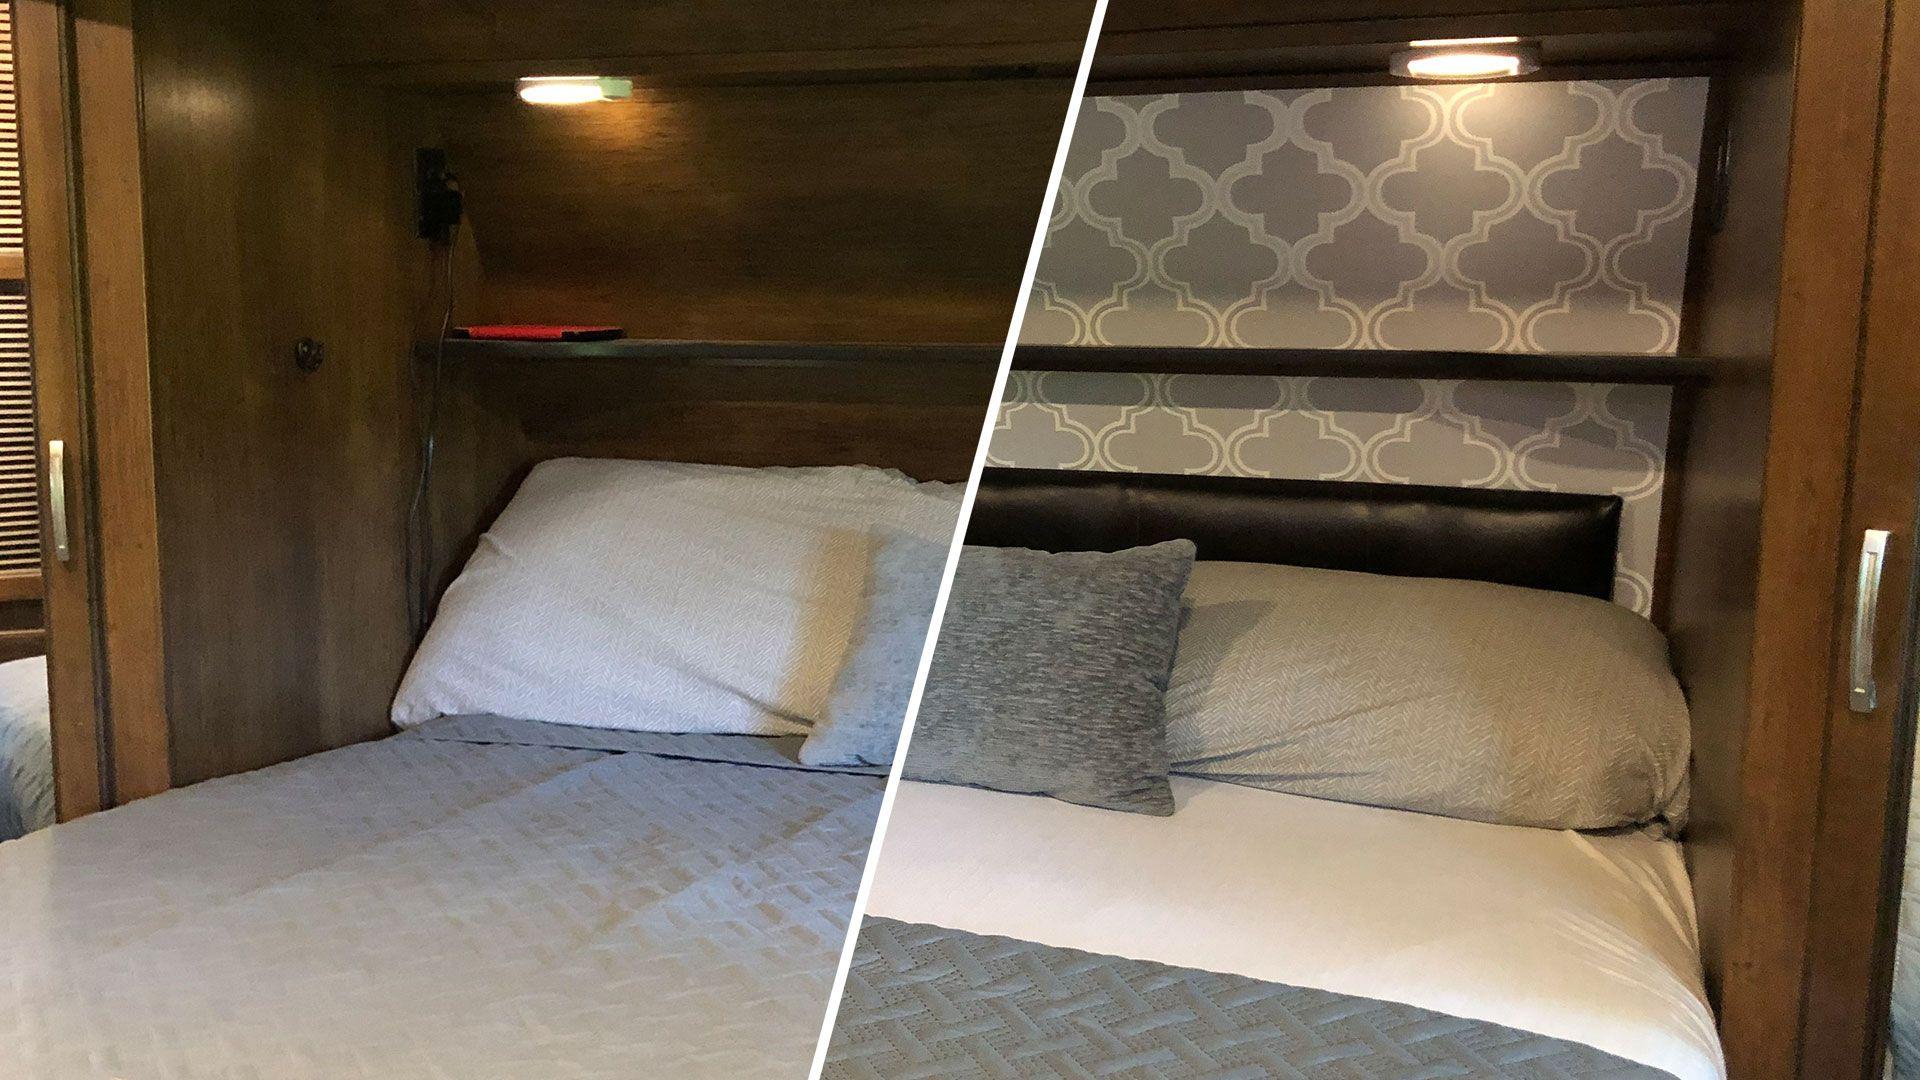 Diy Peel And Stick Wallpaper Rv Headboard Five2go Wallpaper Headboard Rv Wallpaper Wallpaper Bedroom